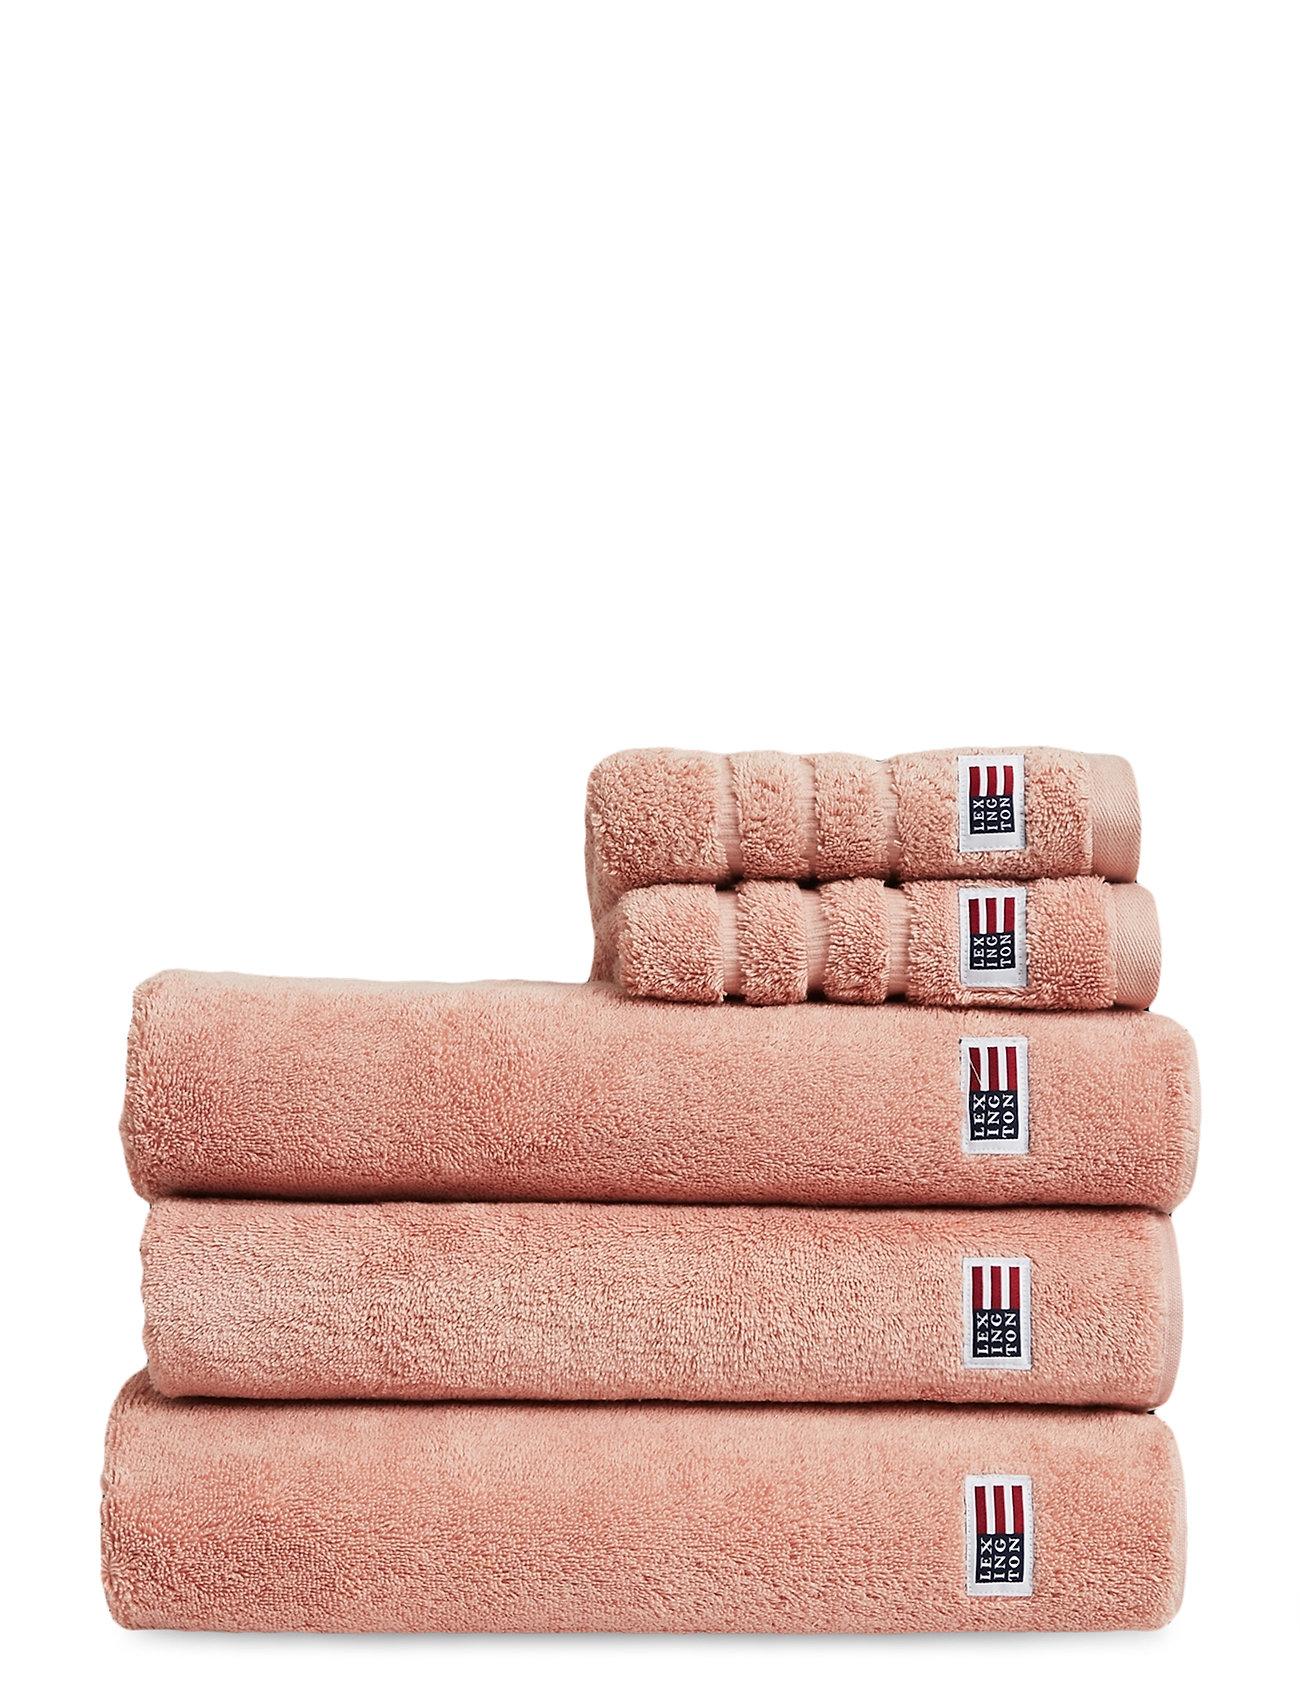 Lexington Home Original Towel Misty Rose - MISTY ROSE